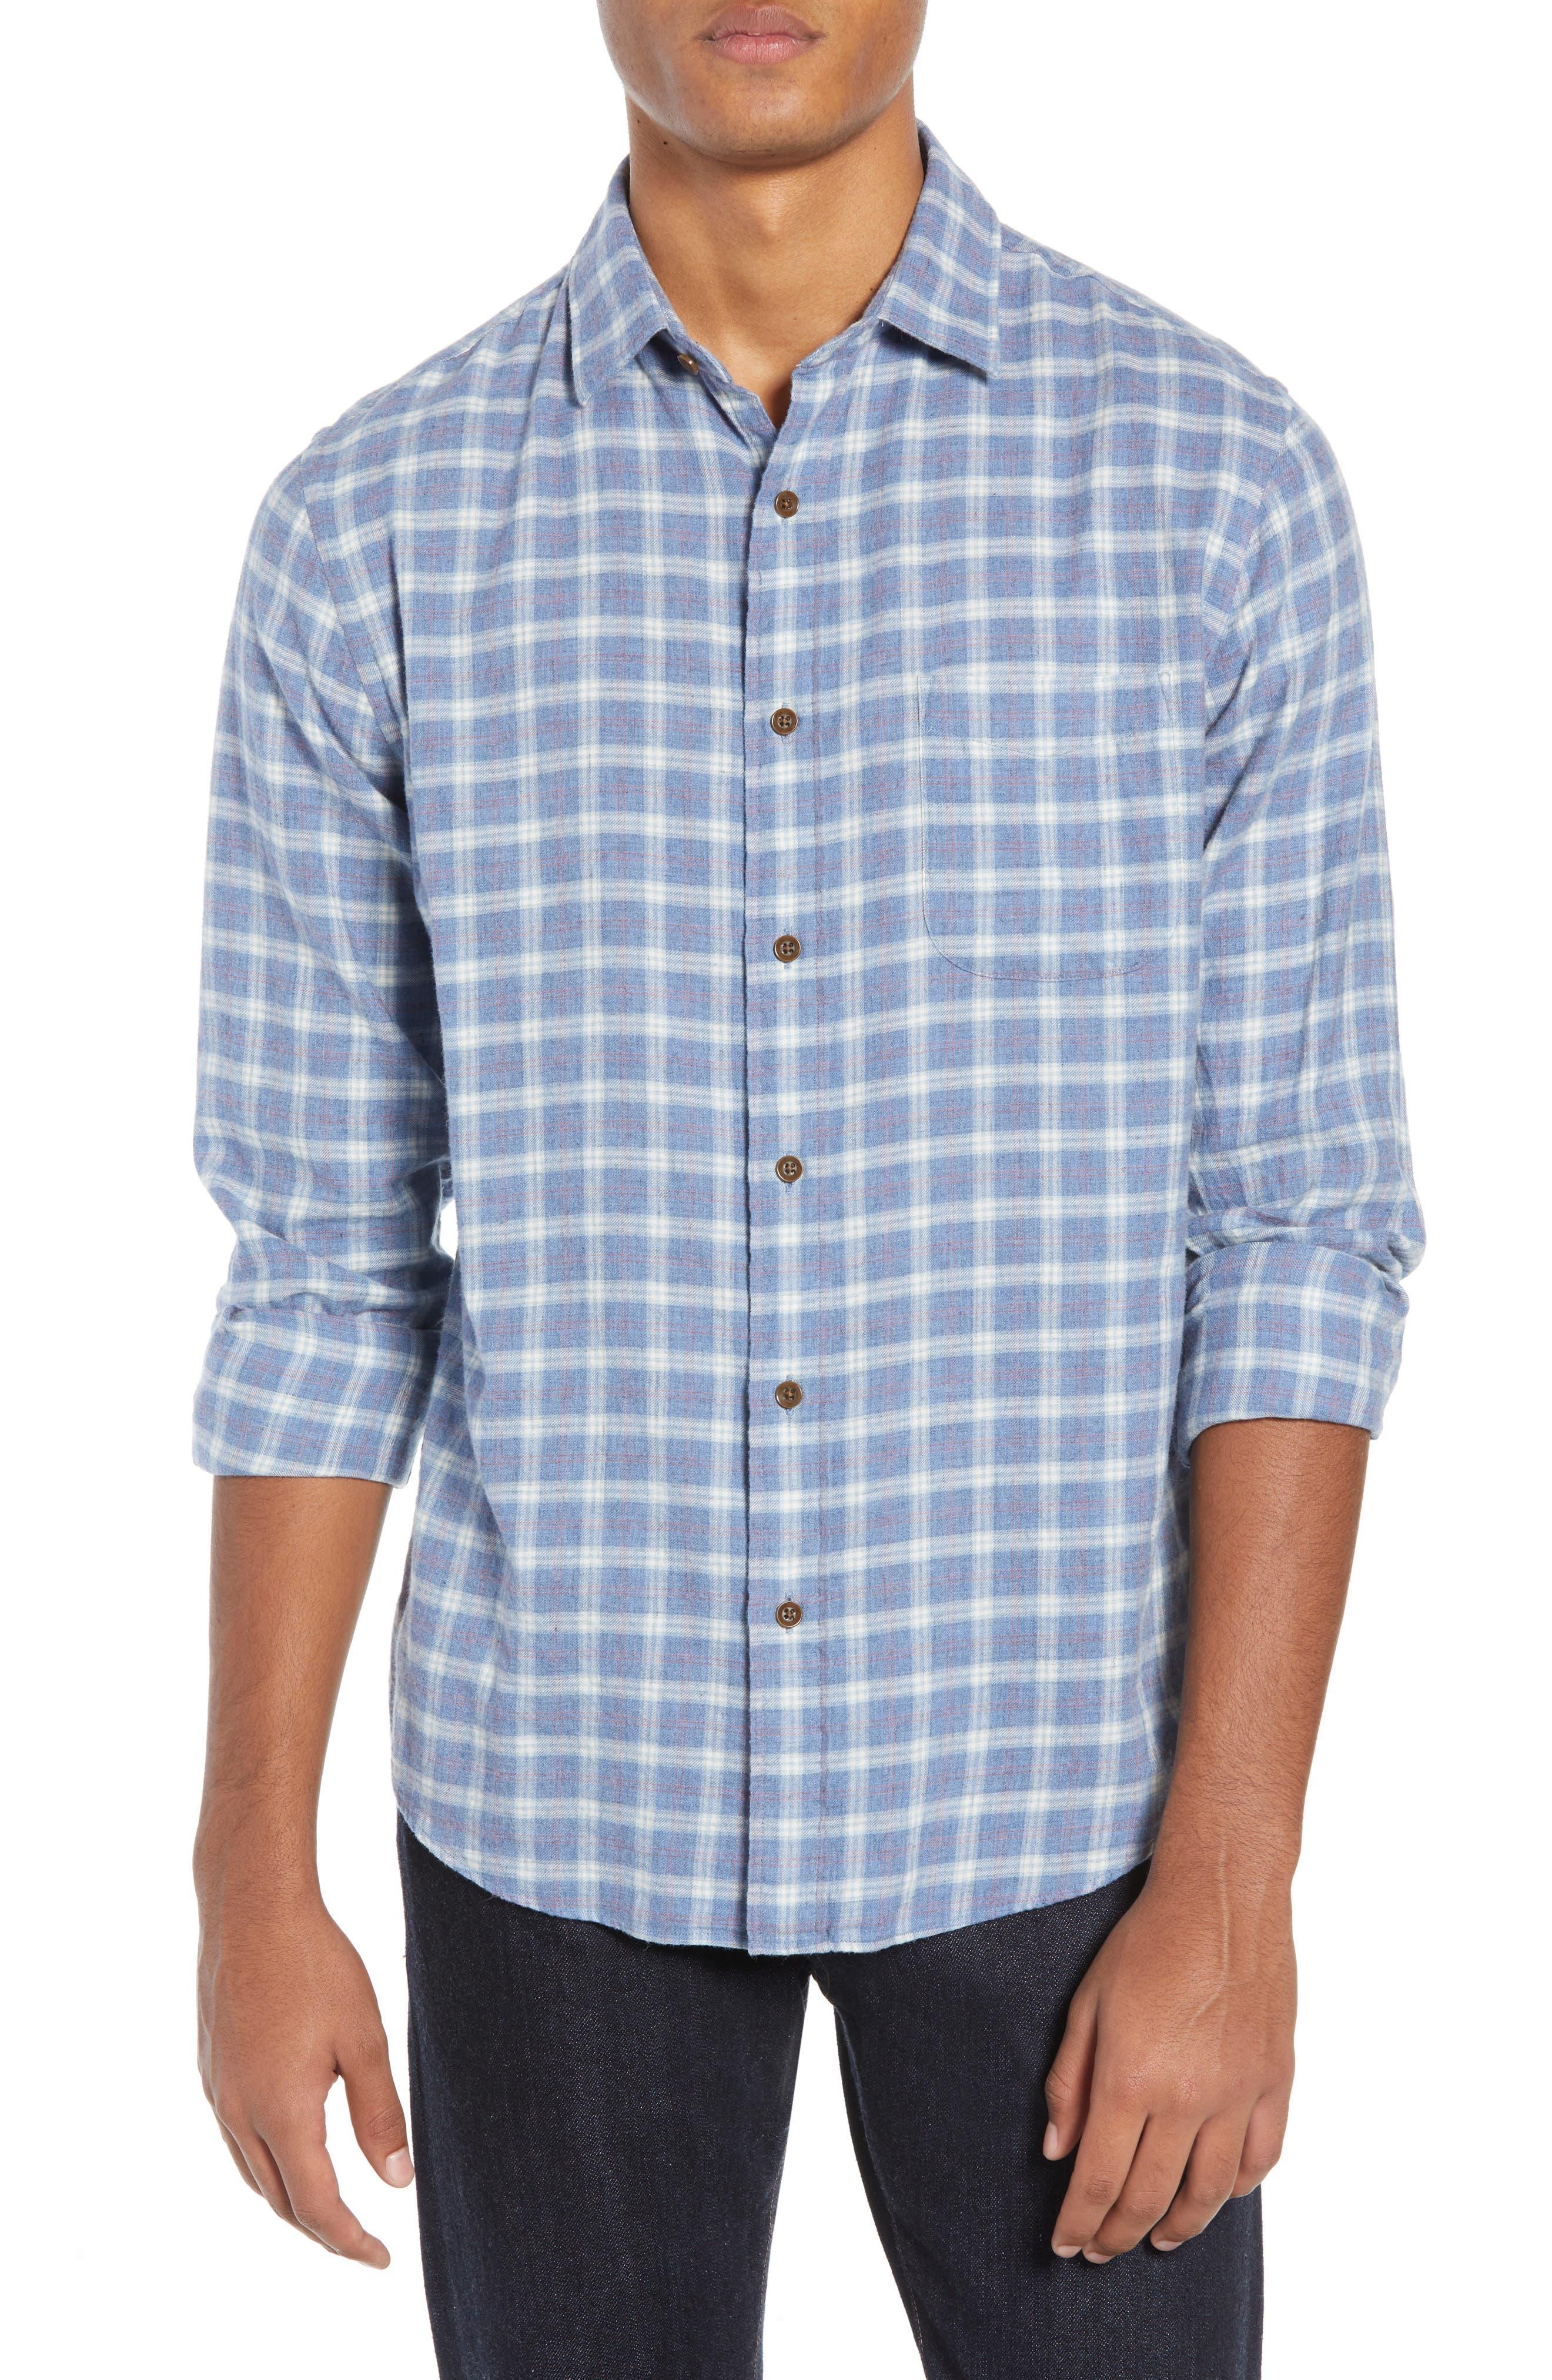 Ventura Oxford Sport Shirt,                             Main thumbnail 1, color,                             HEATHER BLUE CHECK